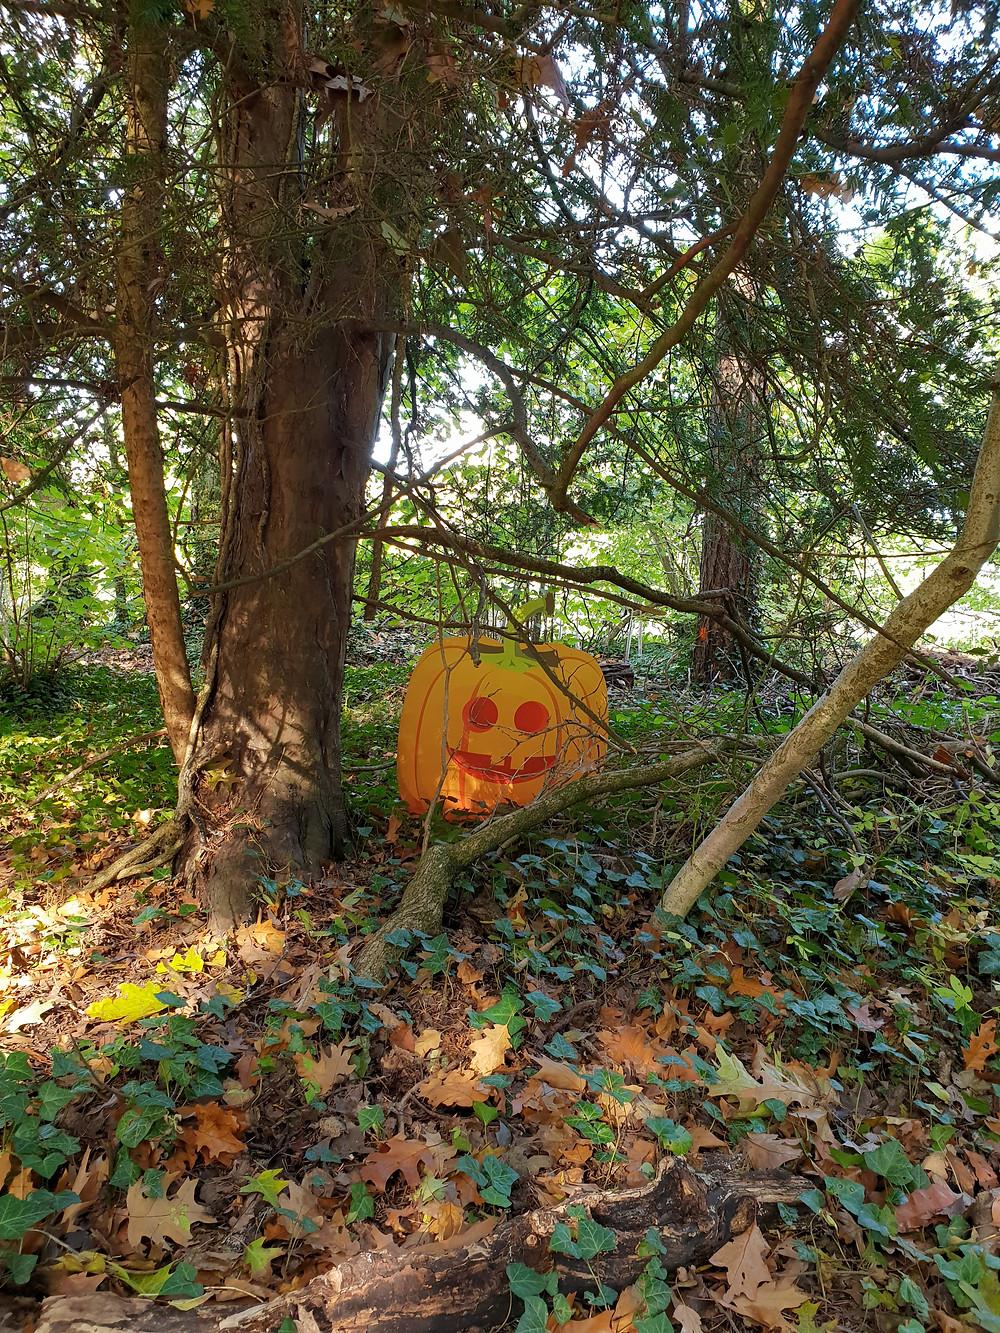 A pumpkin at The Wild Place